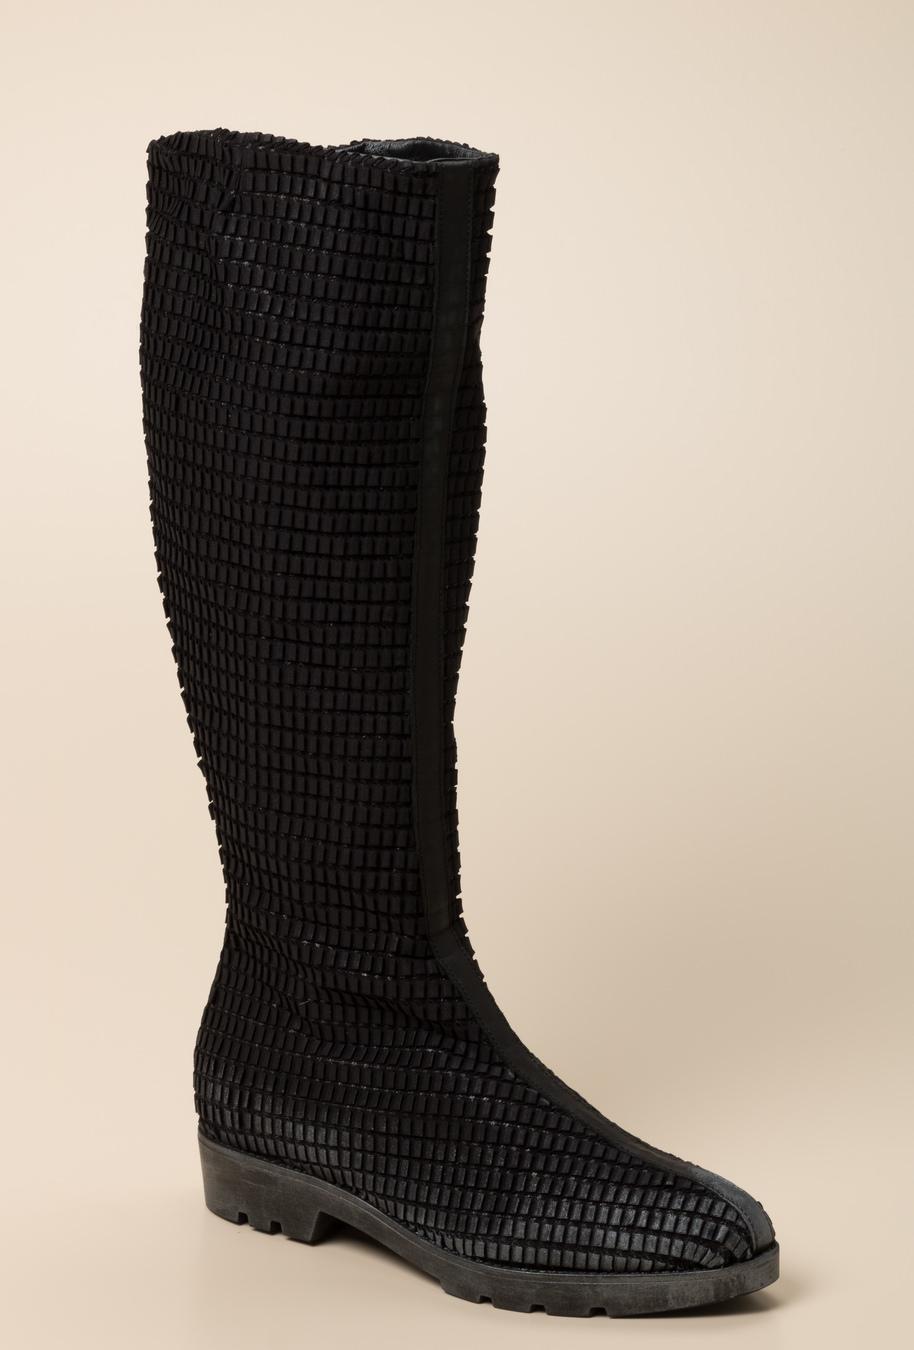 papucei stiefel schwarz